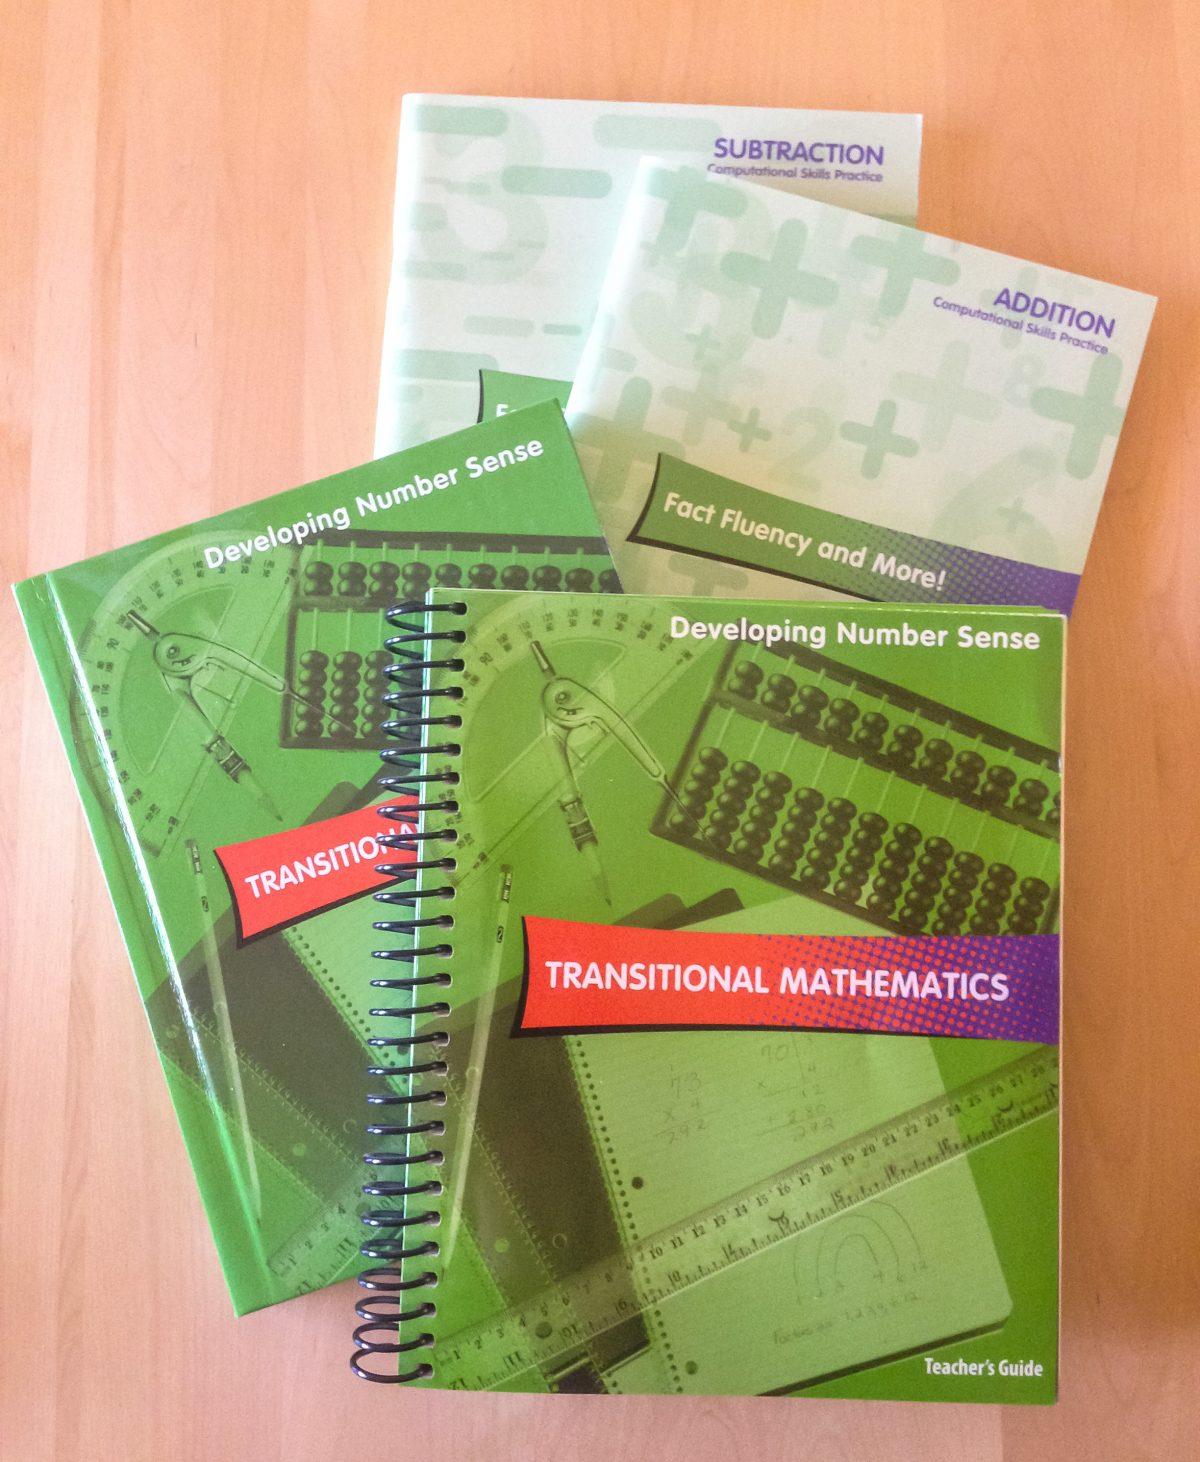 Transitional Mathematics covers